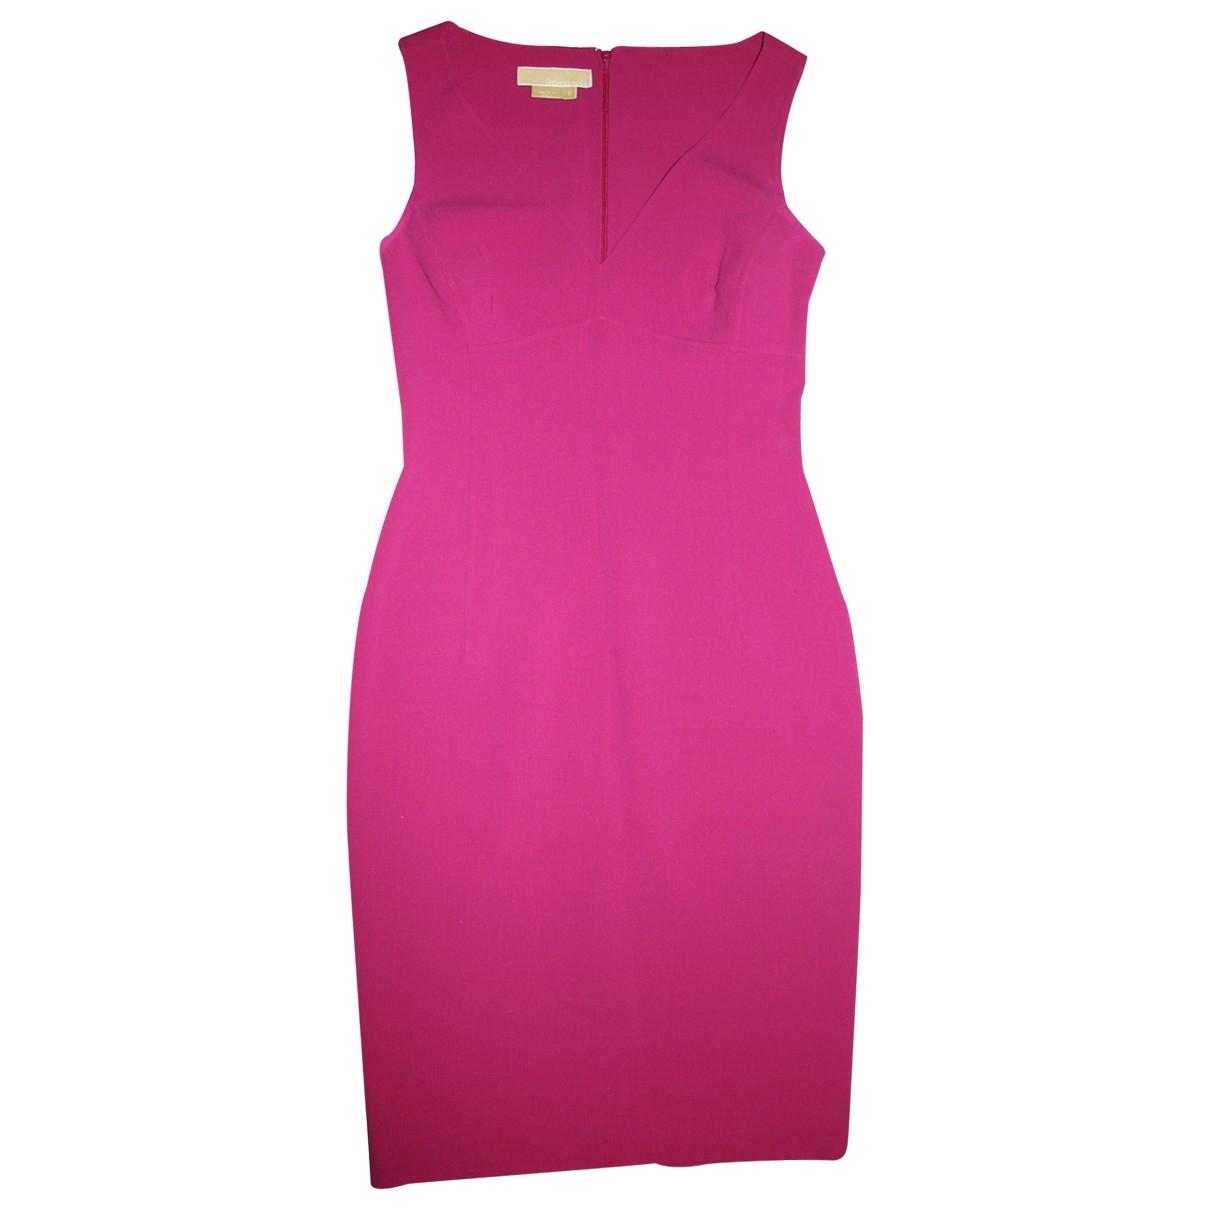 Michael Kors - Robe   pour femme en laine - rose